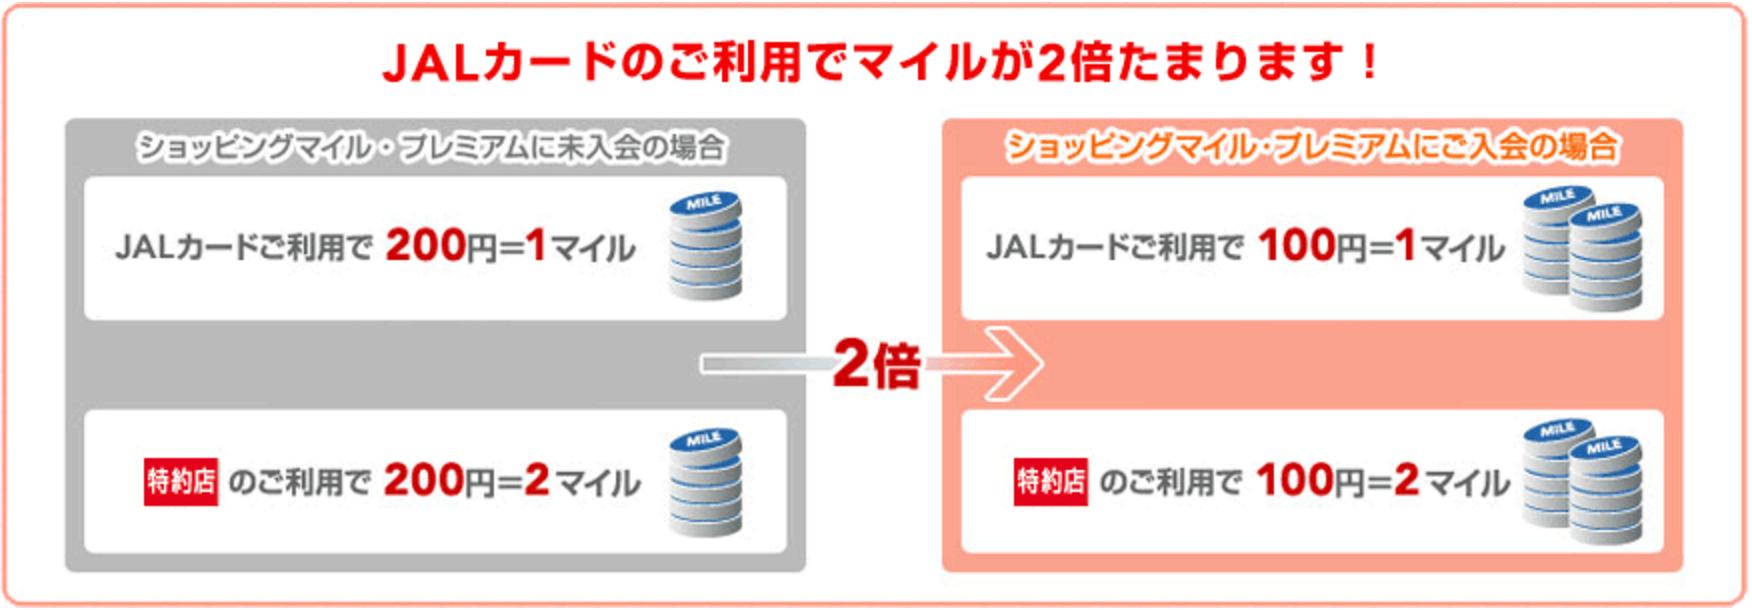 JAL ゴールドカード 小田急 OP JALカードショッピングマイル・プレミアム